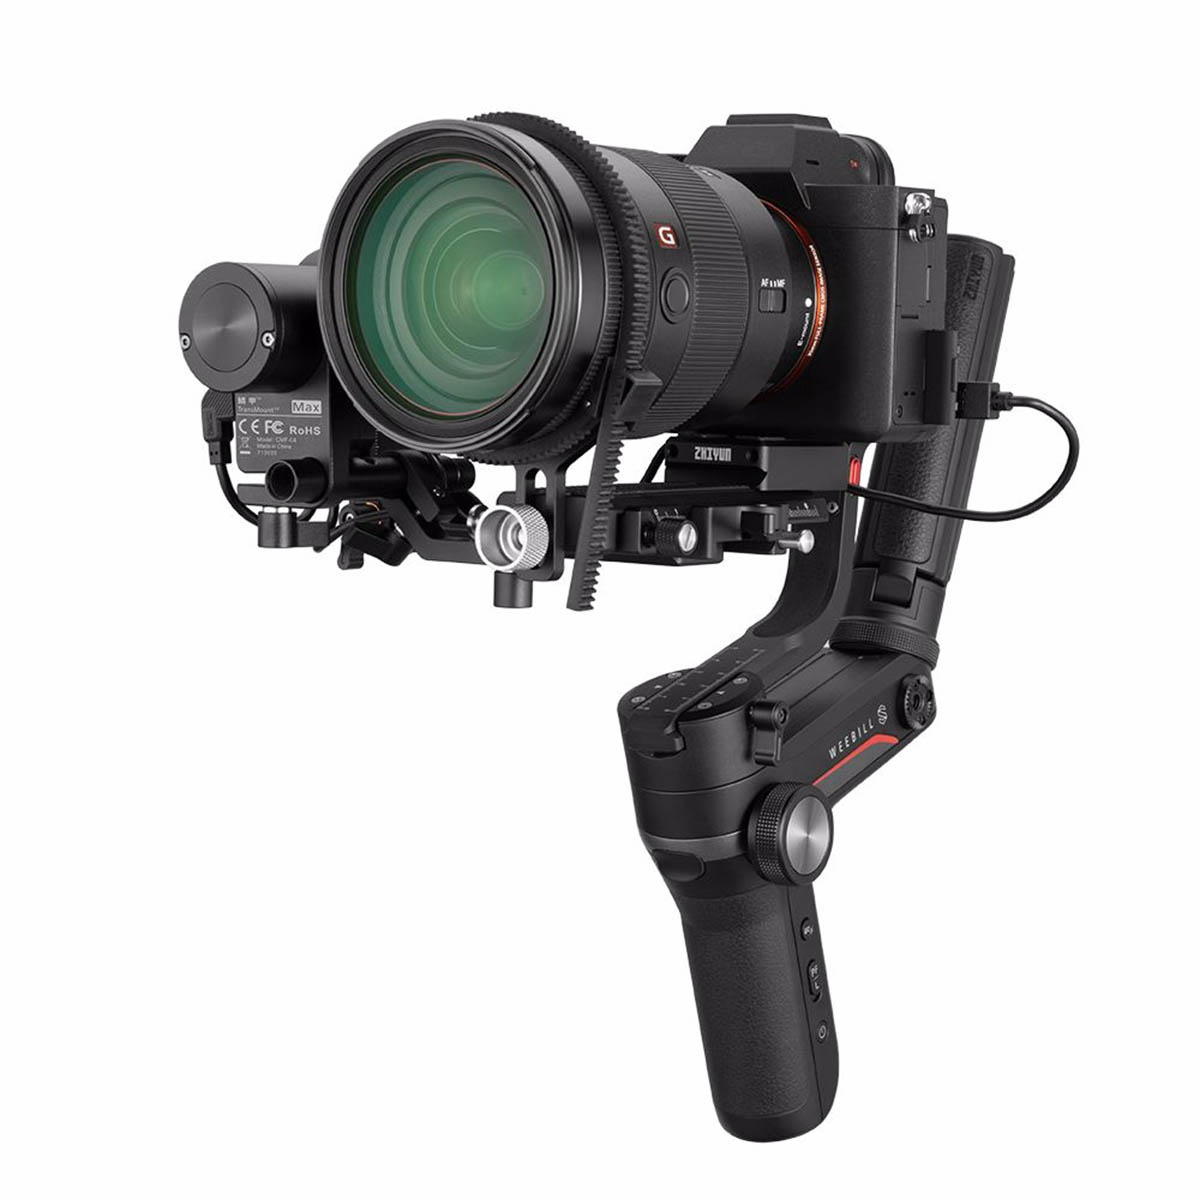 Zhiyun Weebill S elektronický stabilizátor pre mini kamery a DSLR